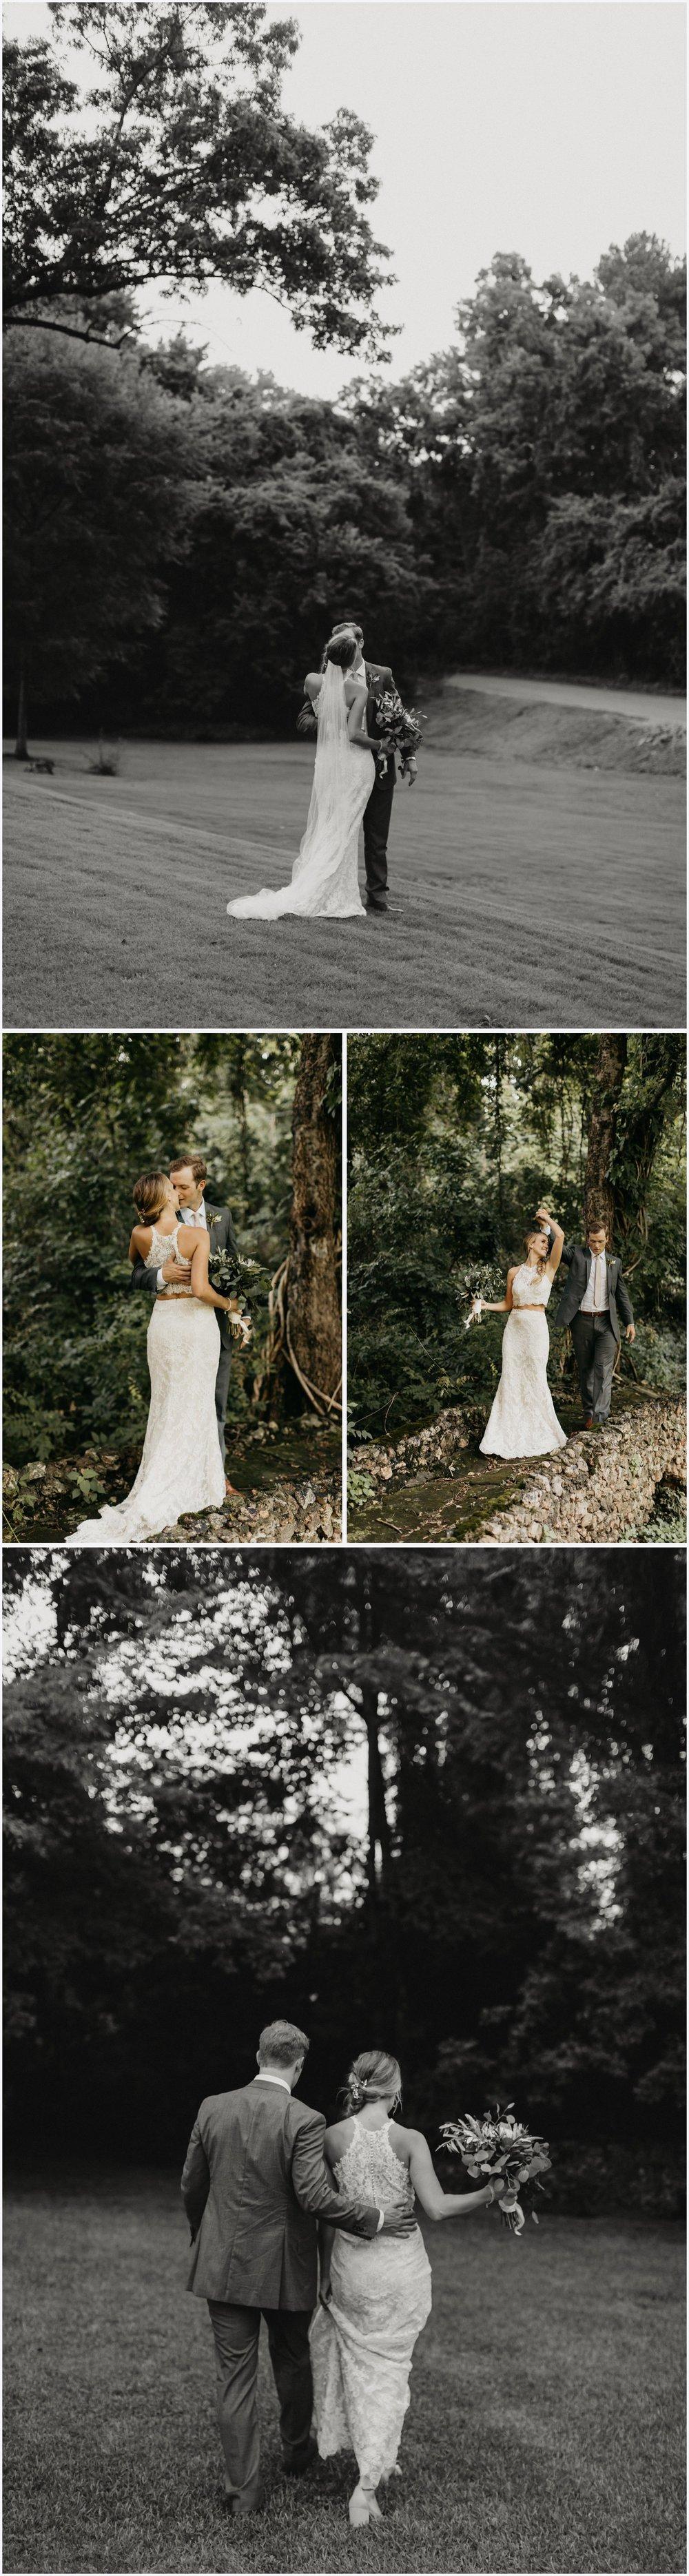 Gabrella Manor Wedding Birmingham Alabama_0042.jpg